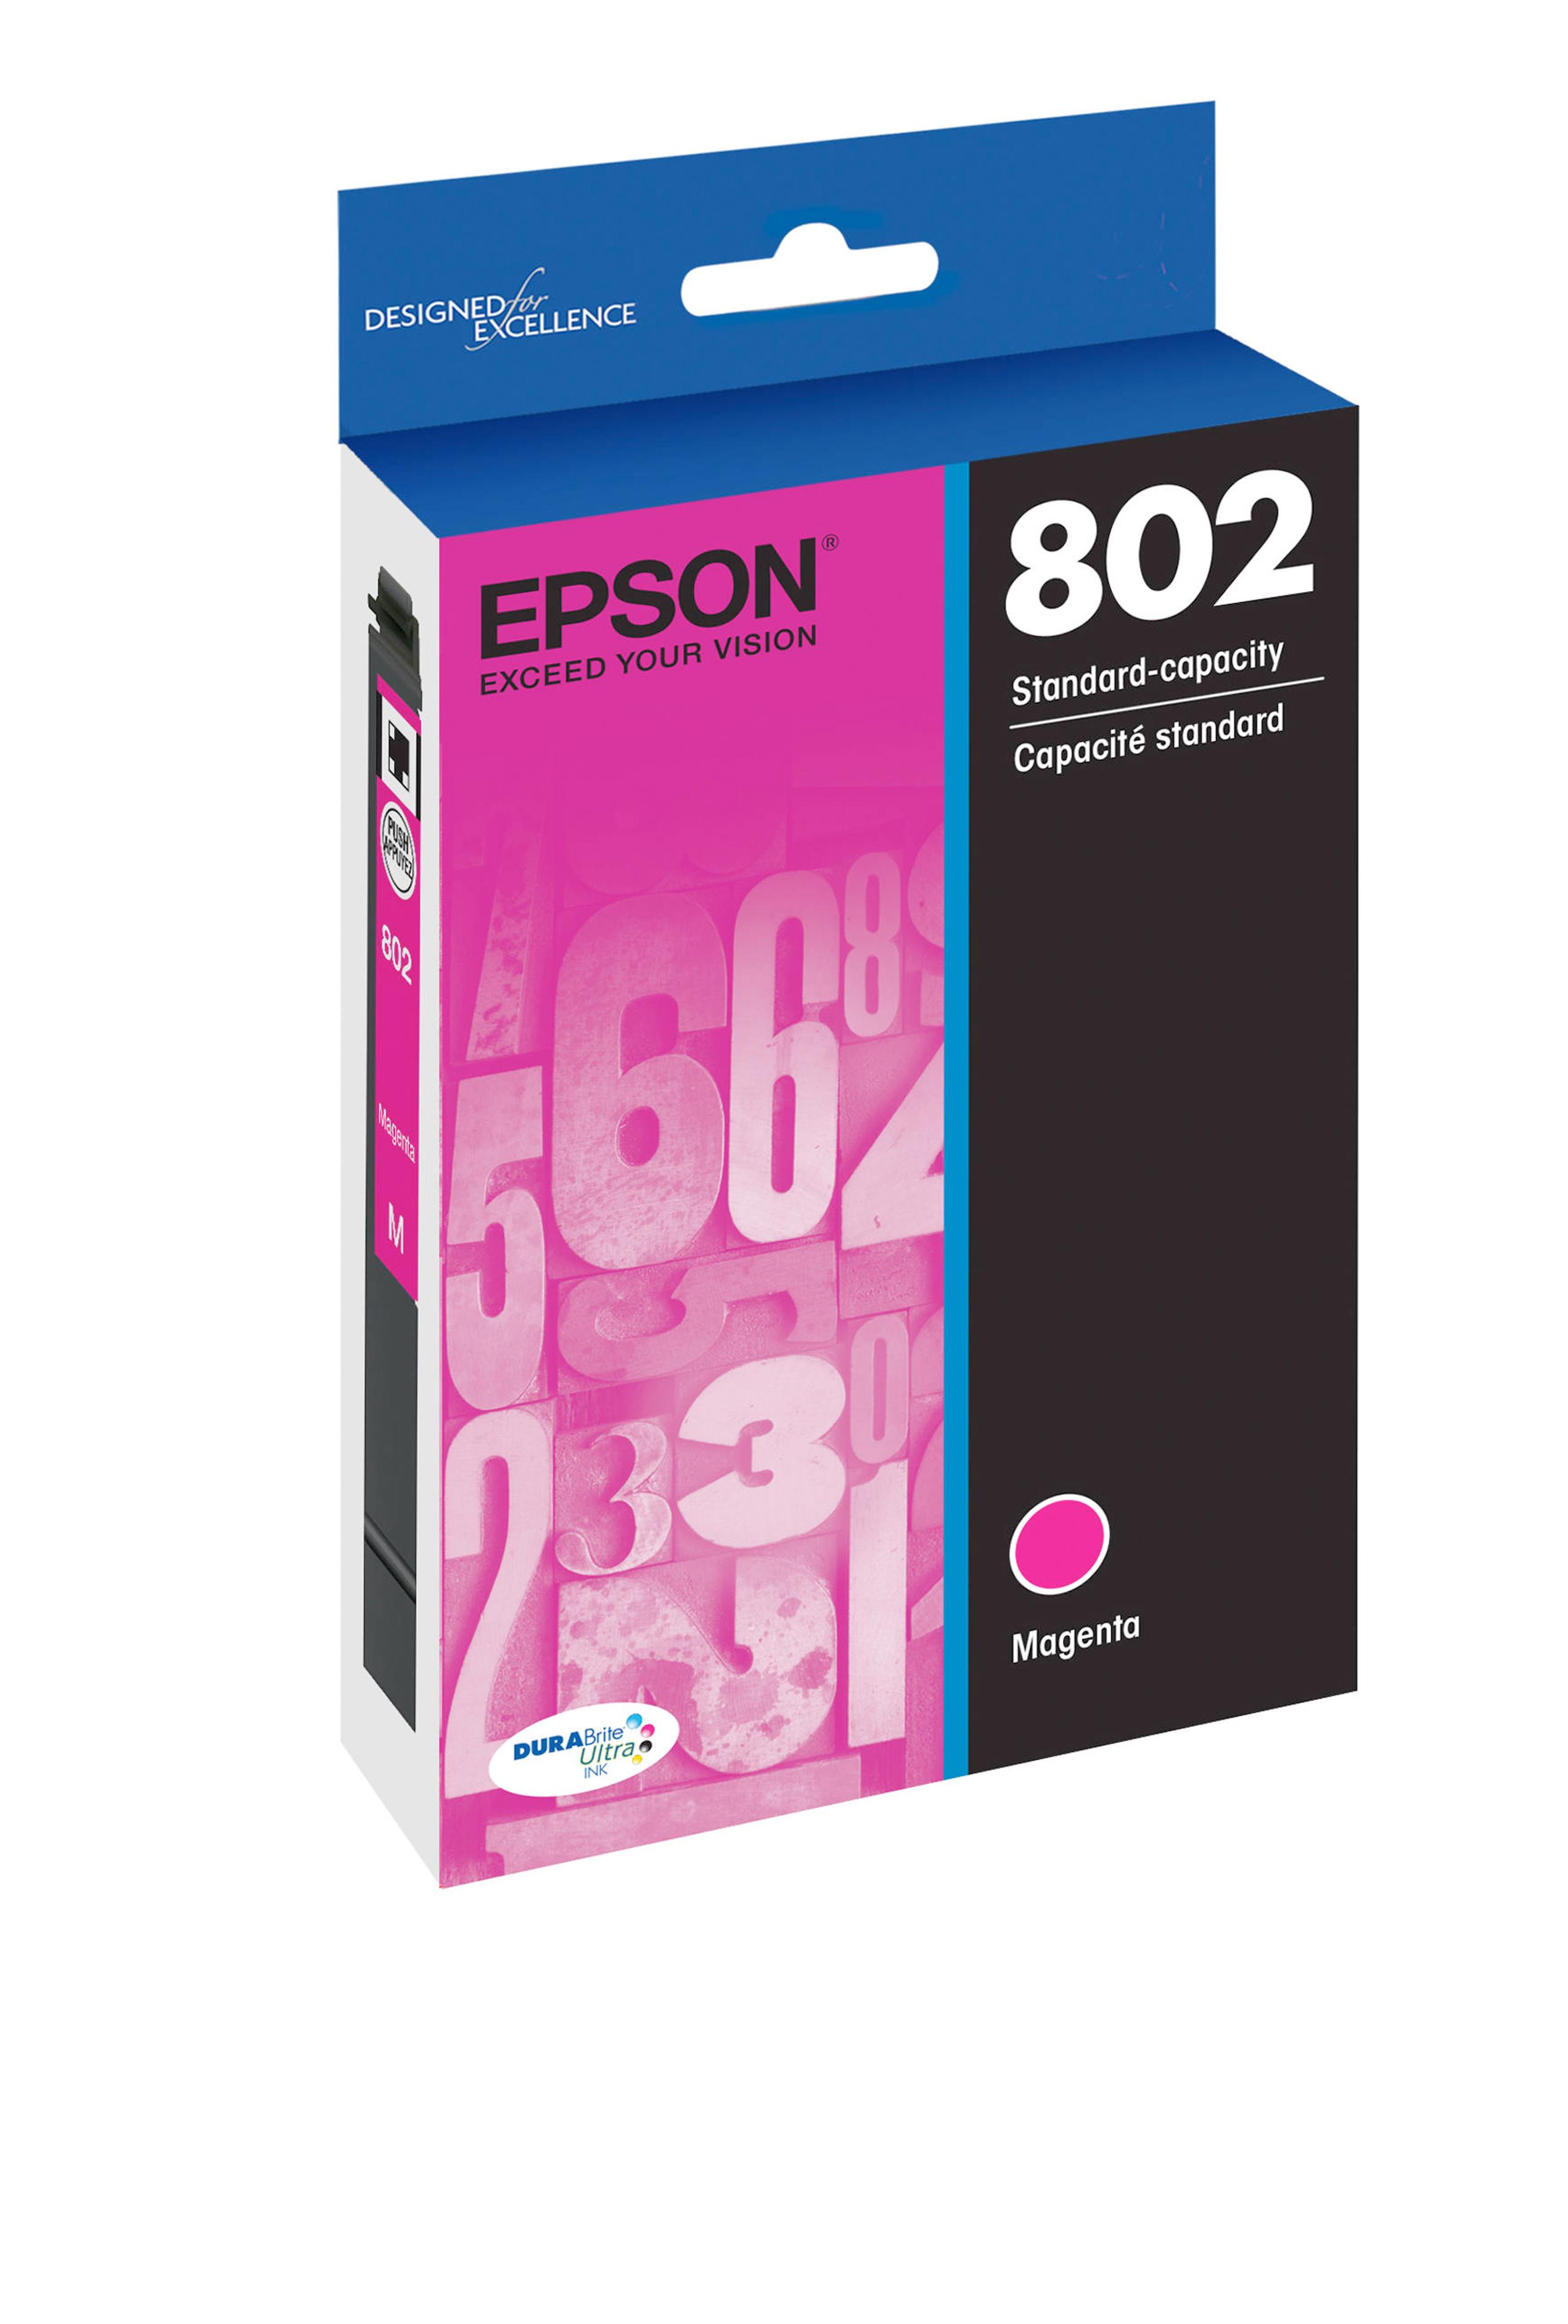 Epson T802, Magenta Ink Cartridge (T802320-S)